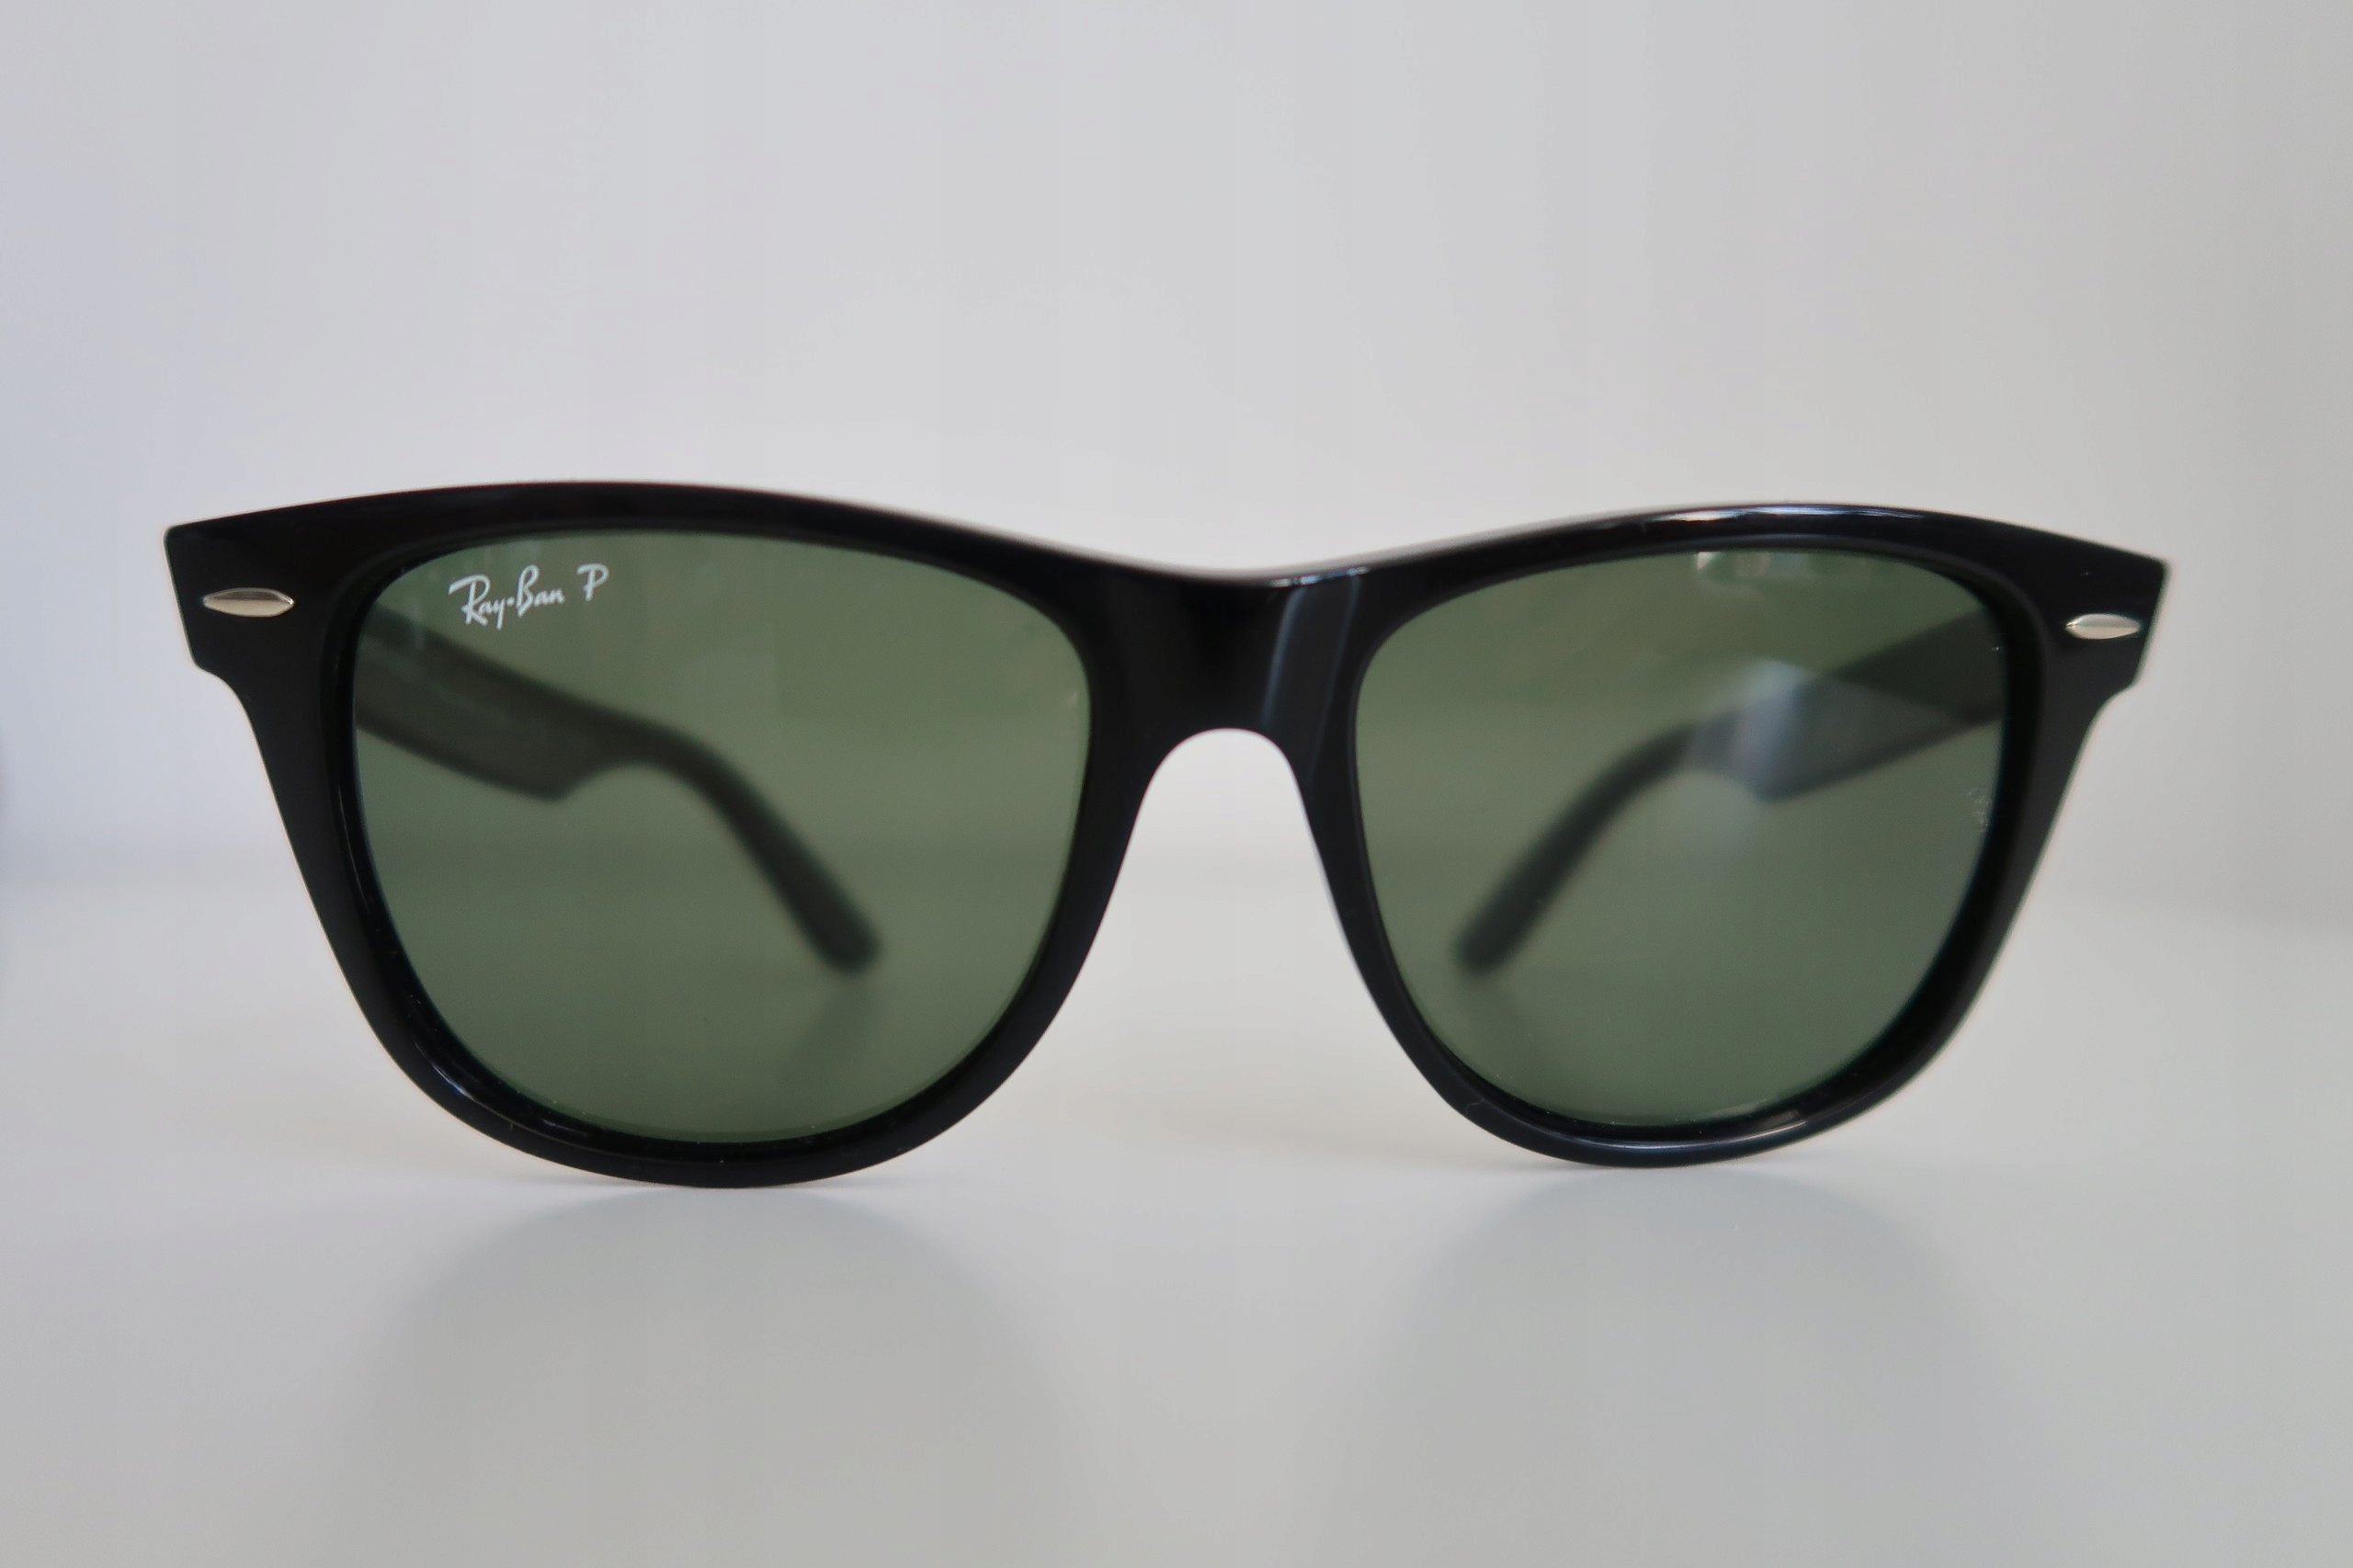 e7ef15eef75cef Okulary Ray-Ban RB2140 901 54-18 WAYFARER - 7468000343 - oficjalne ...